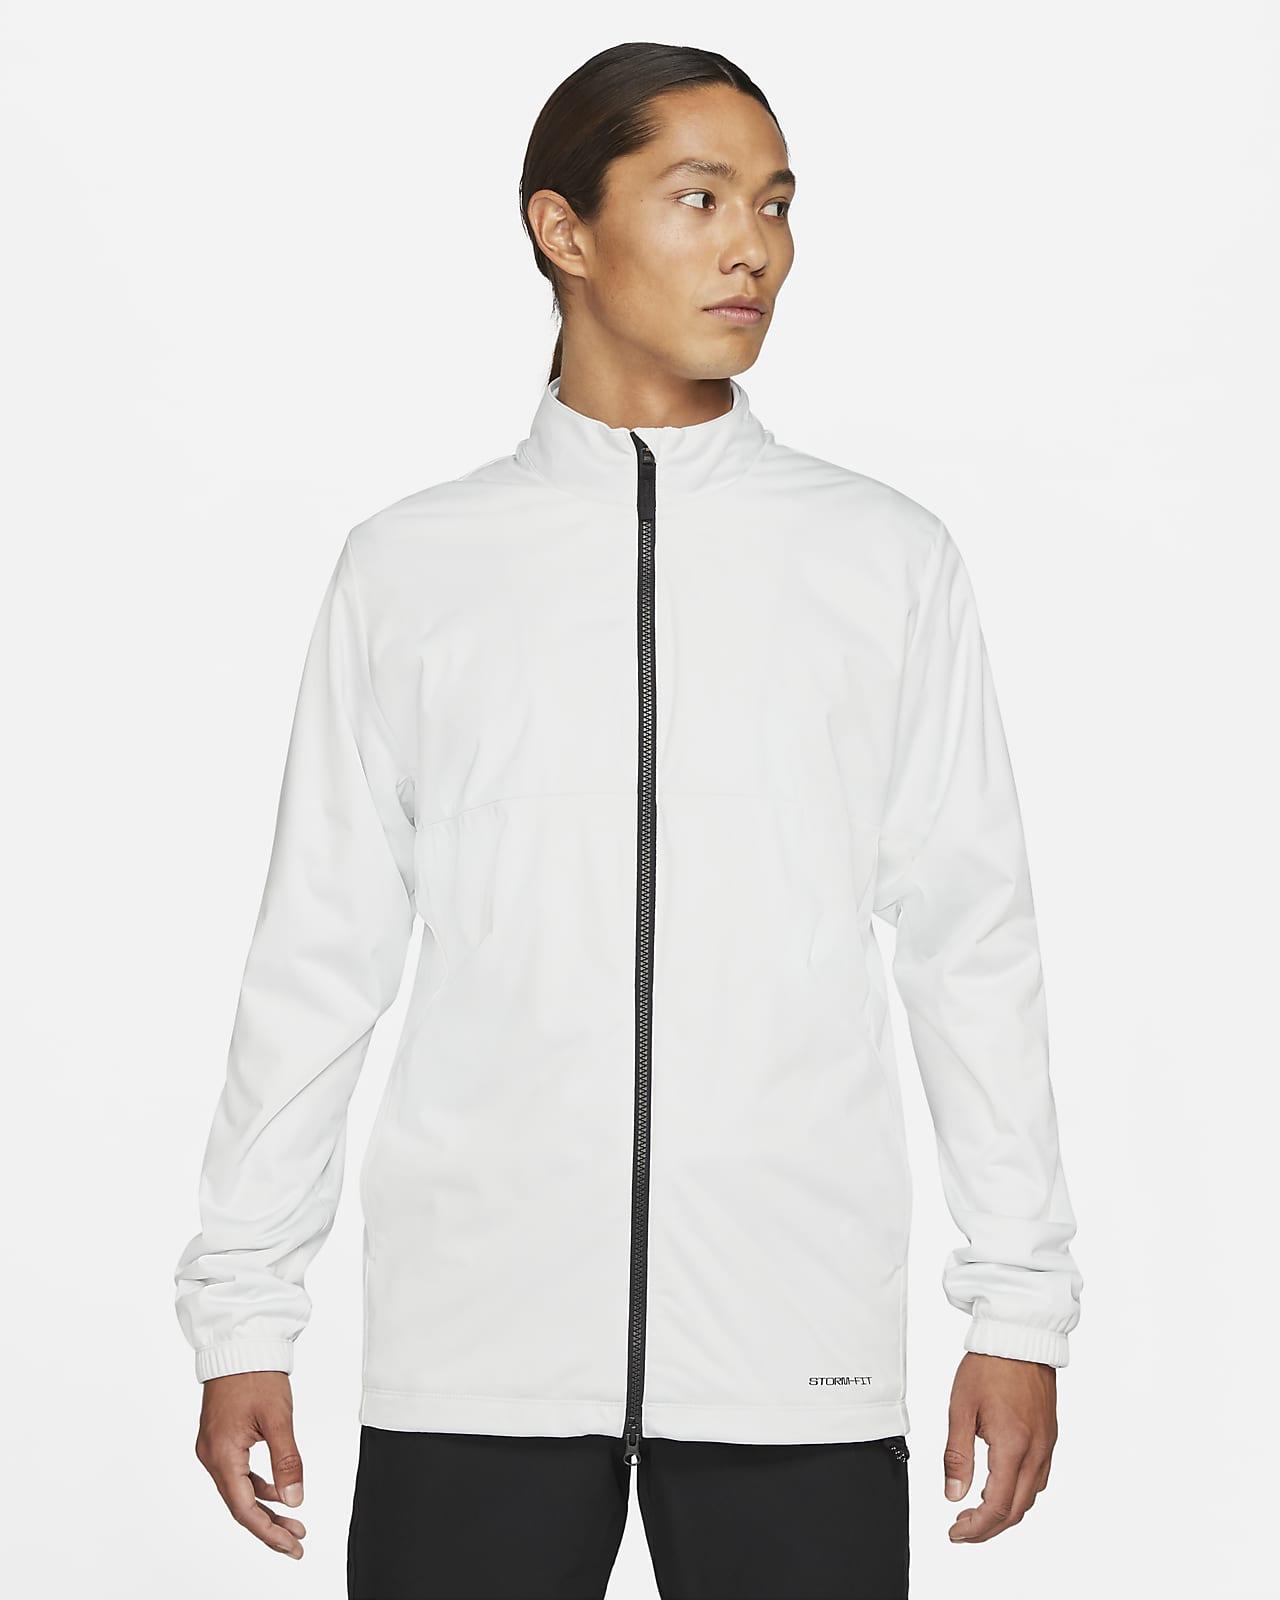 Nike Storm-FIT Victory Men's Full-Zip Golf Jacket